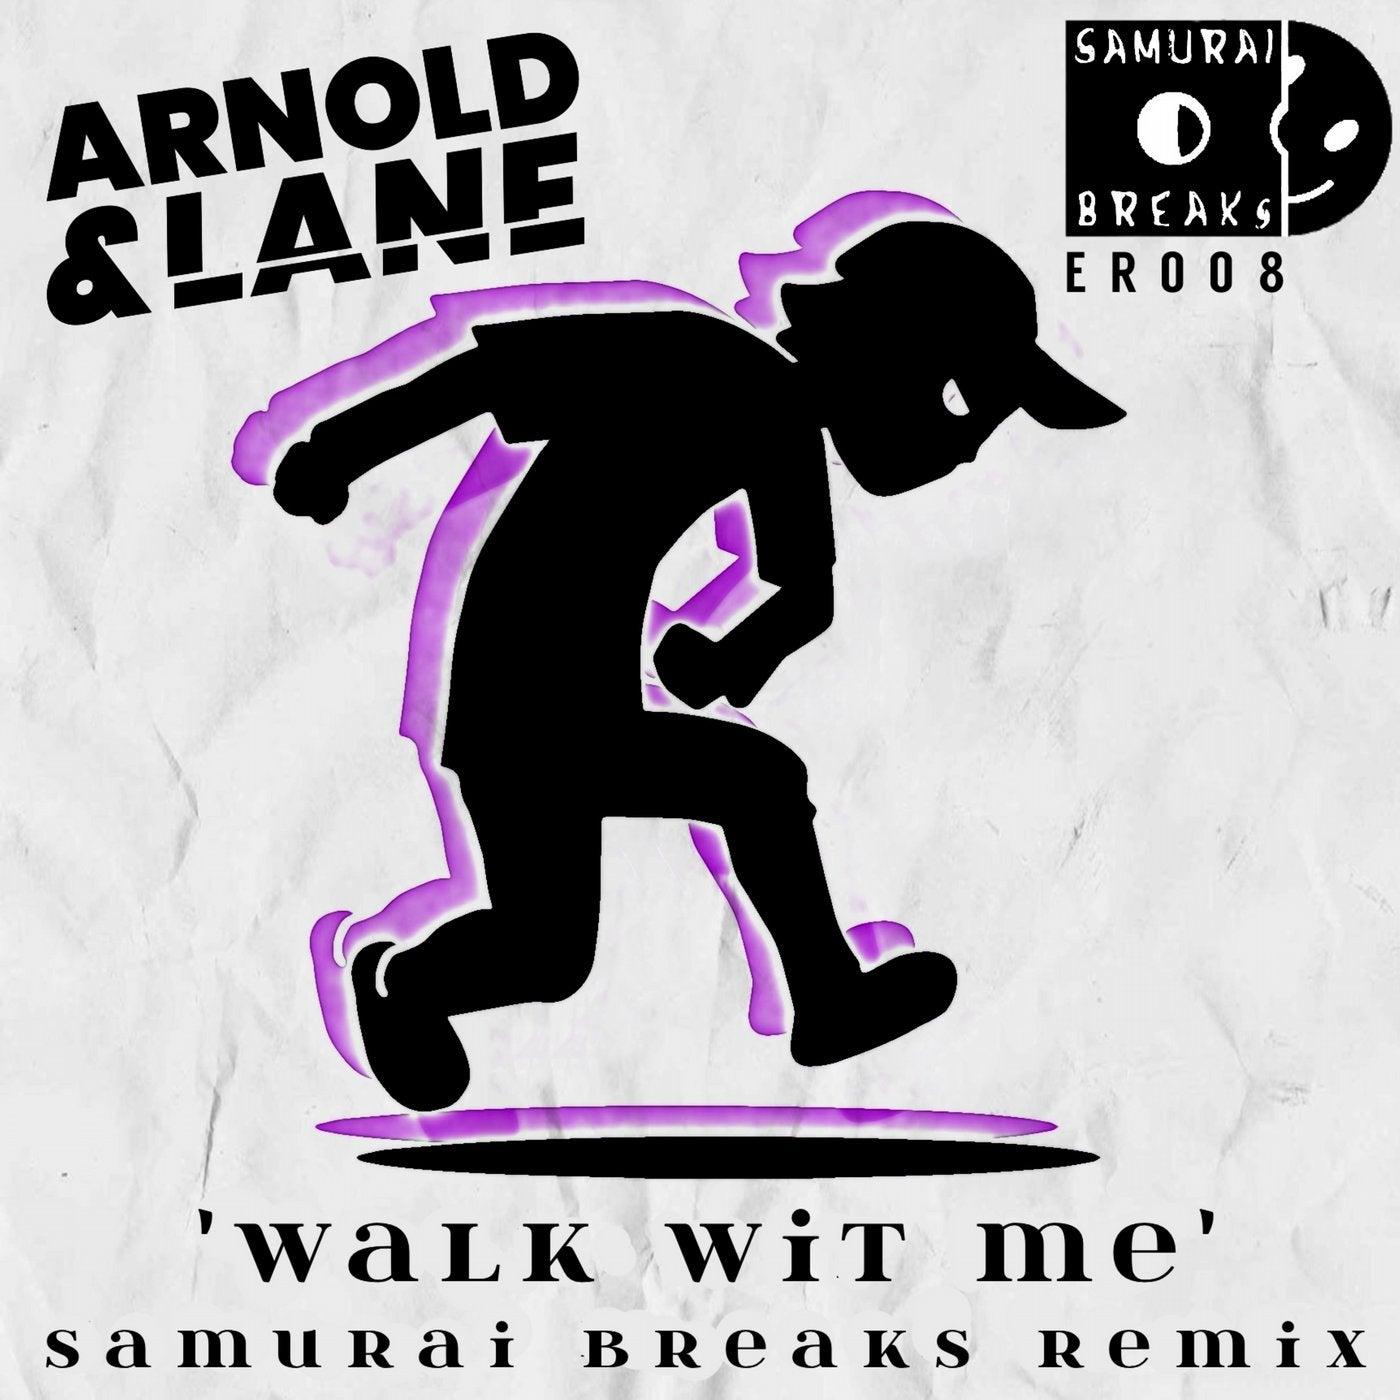 Walk Wit Me (Samurai Breaks Remix)